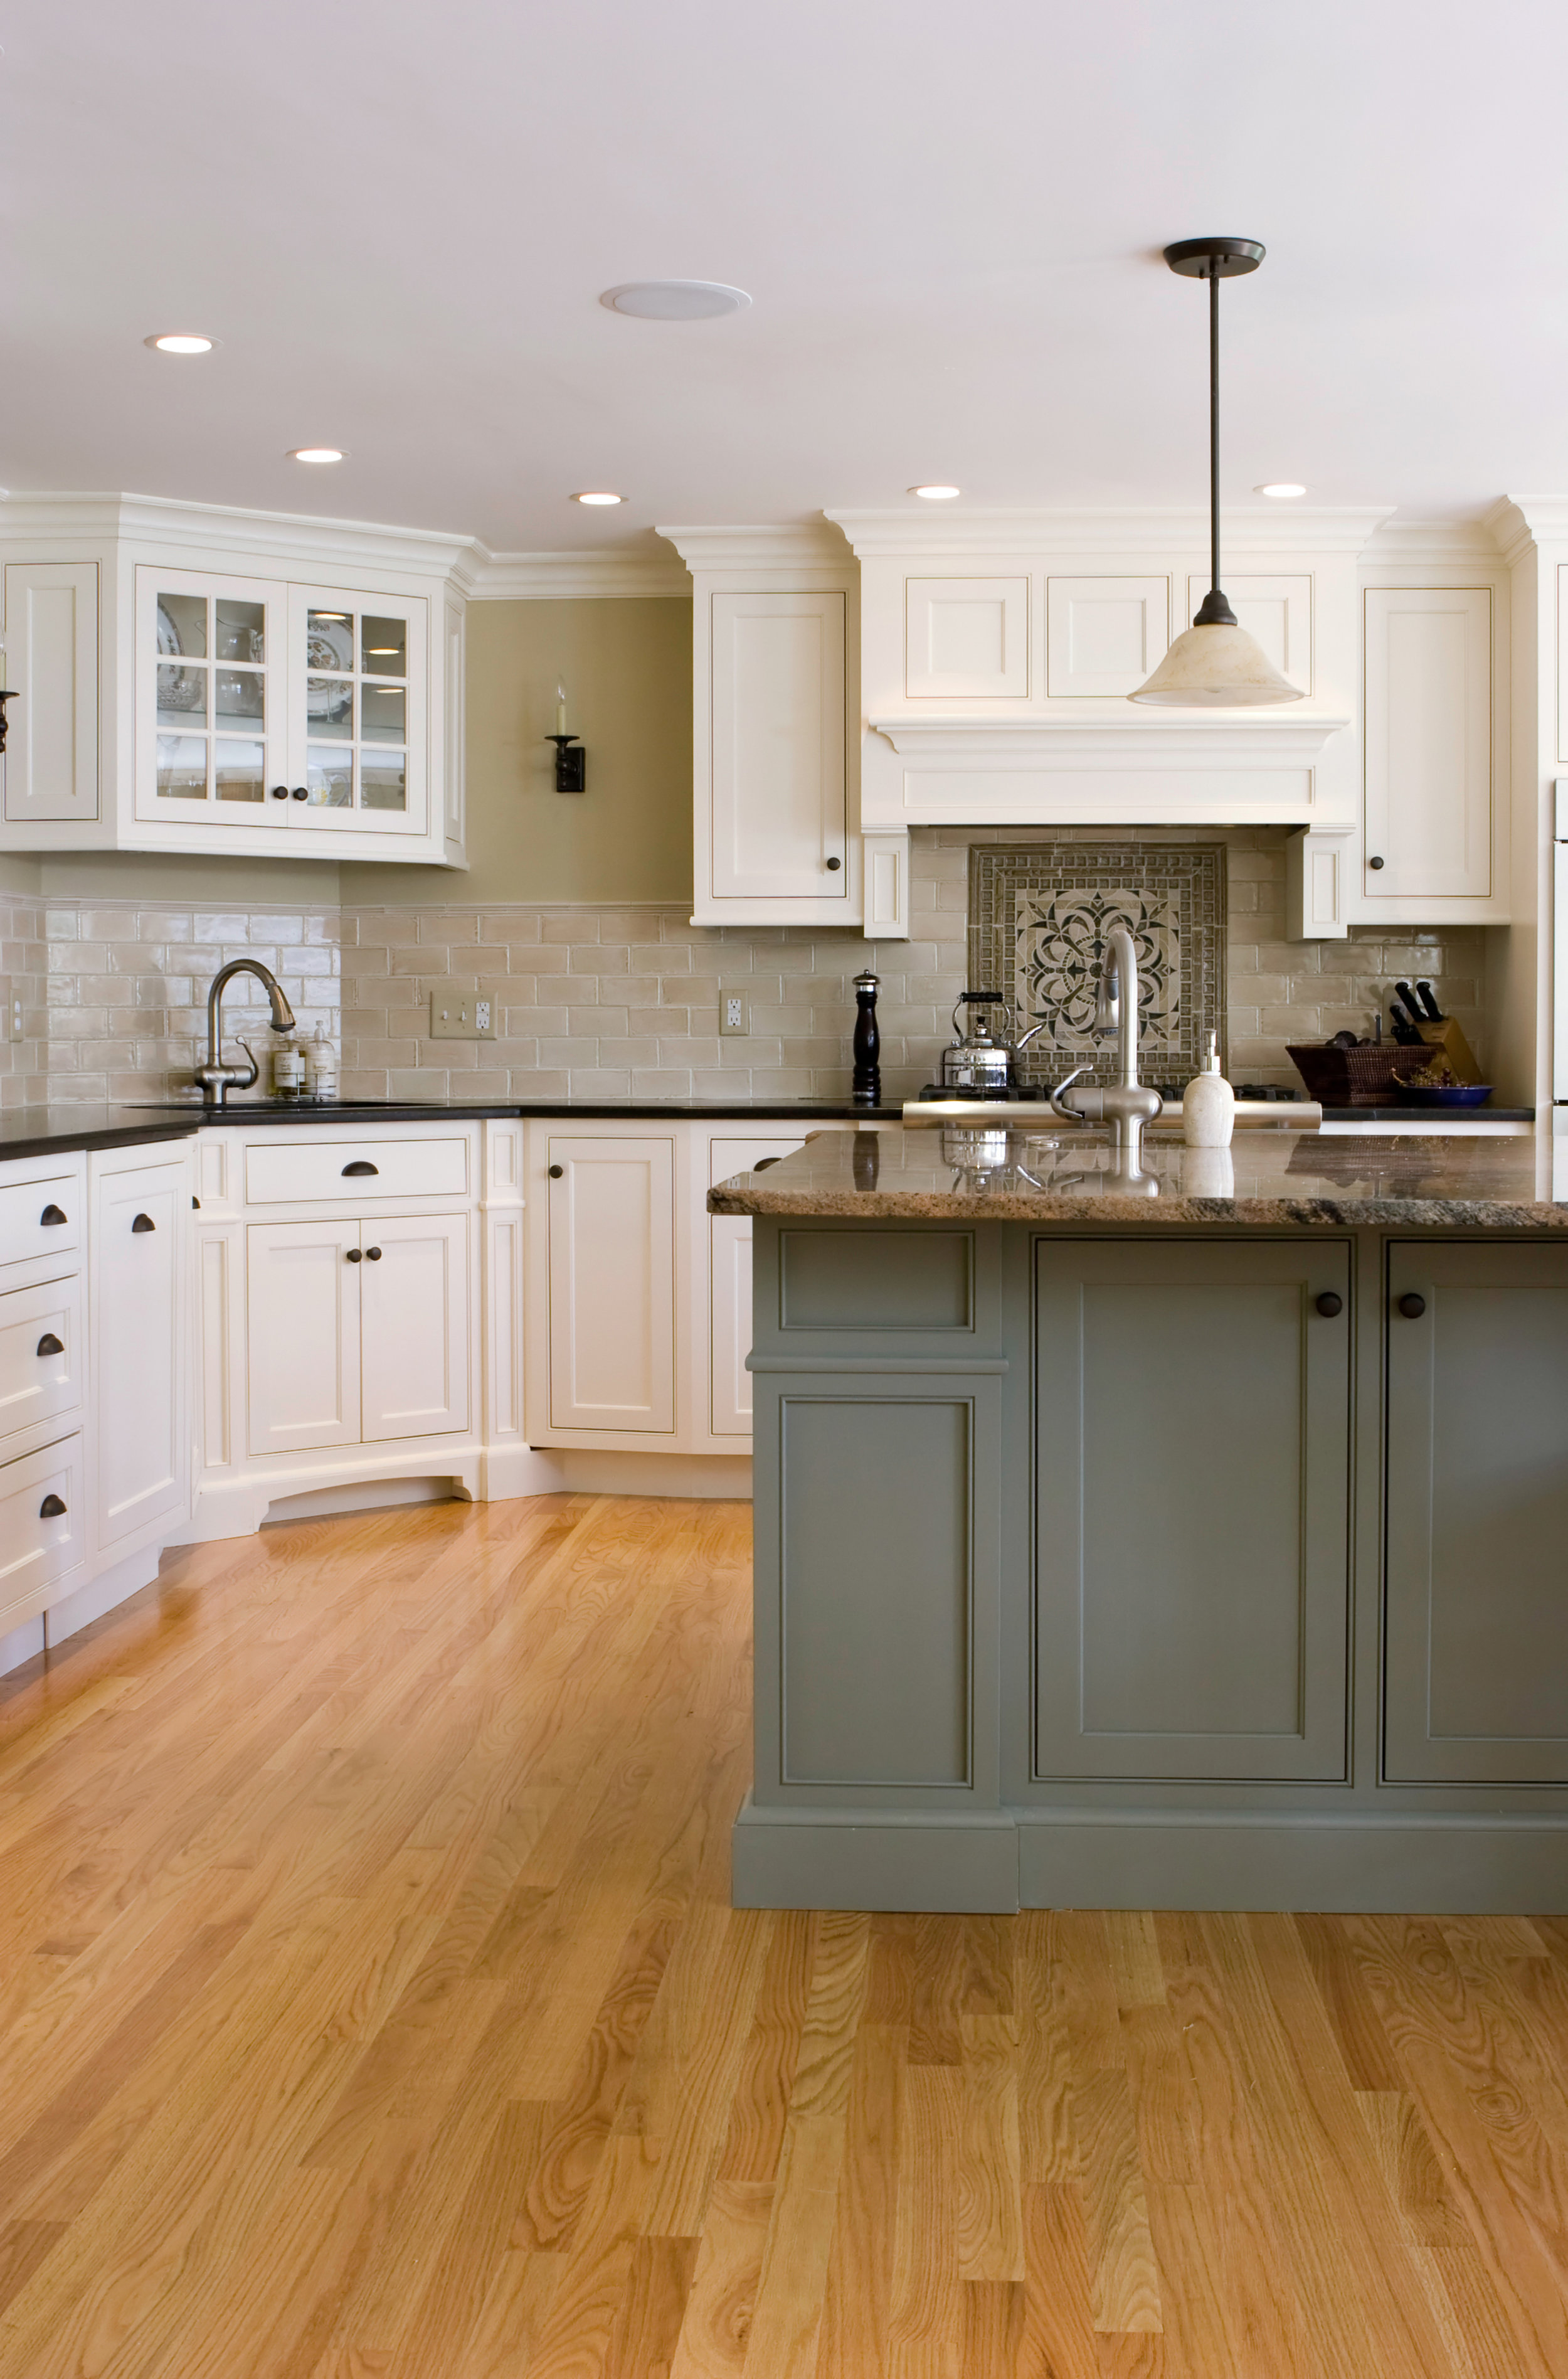 Cabinet and Kitchen Upgrade Design